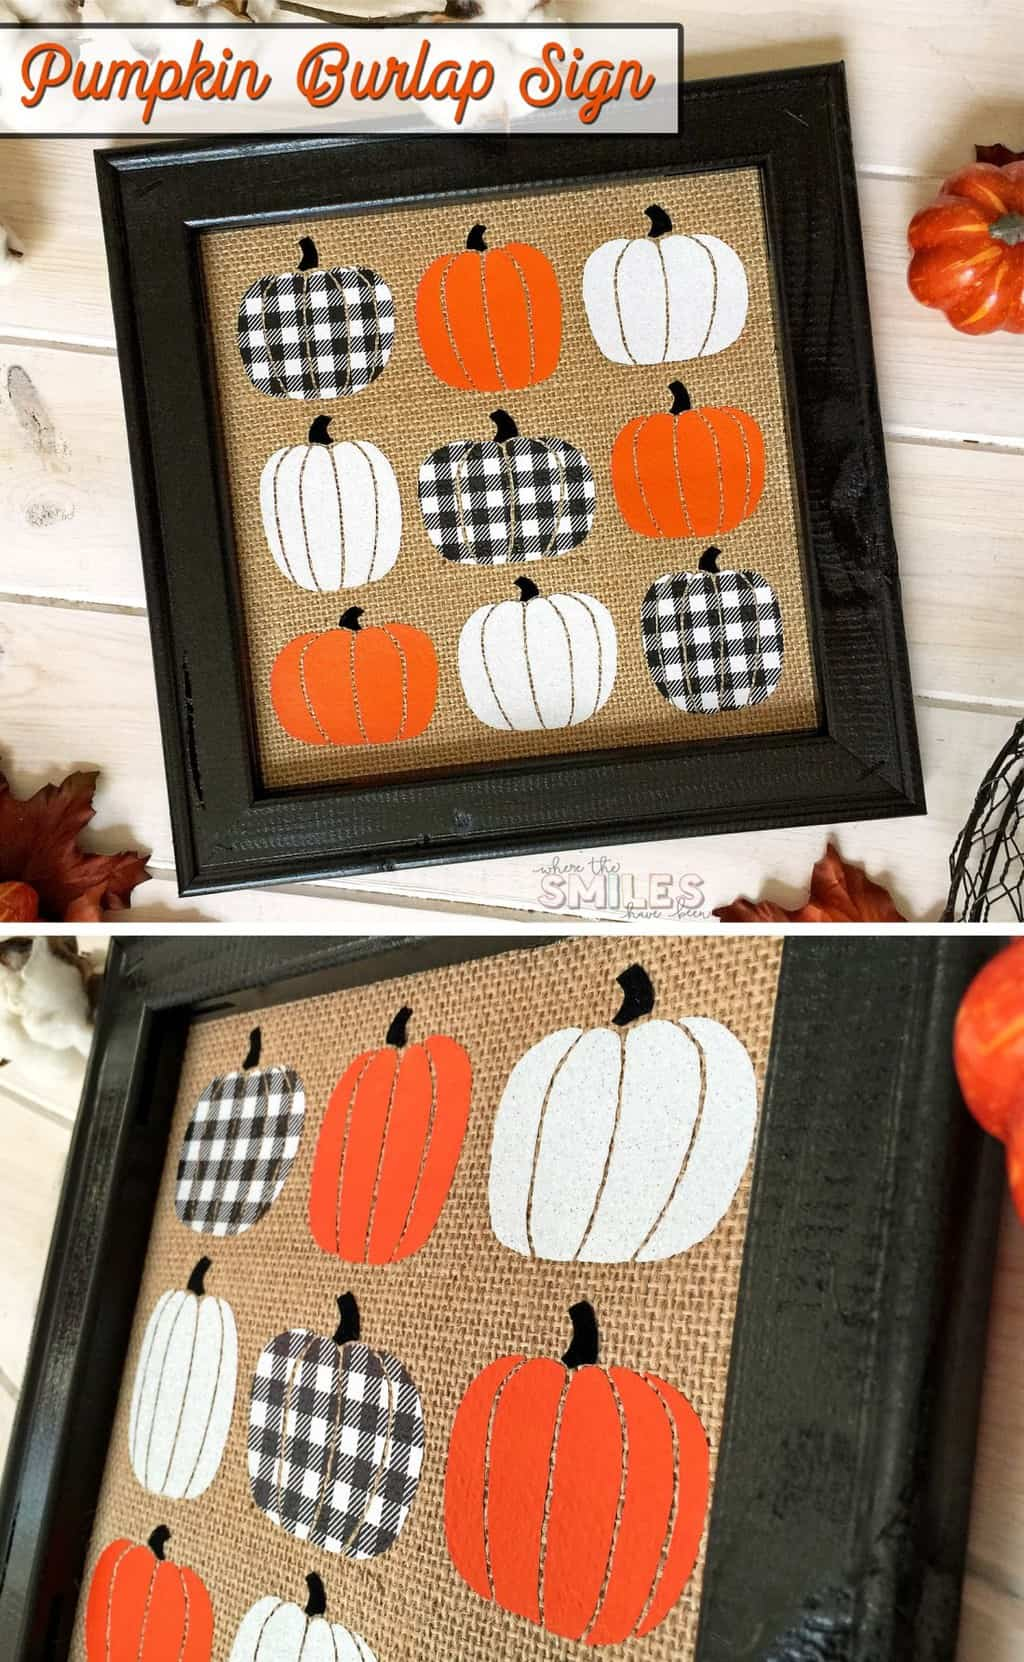 Pumpkin-Burlap-Sign-Graphic